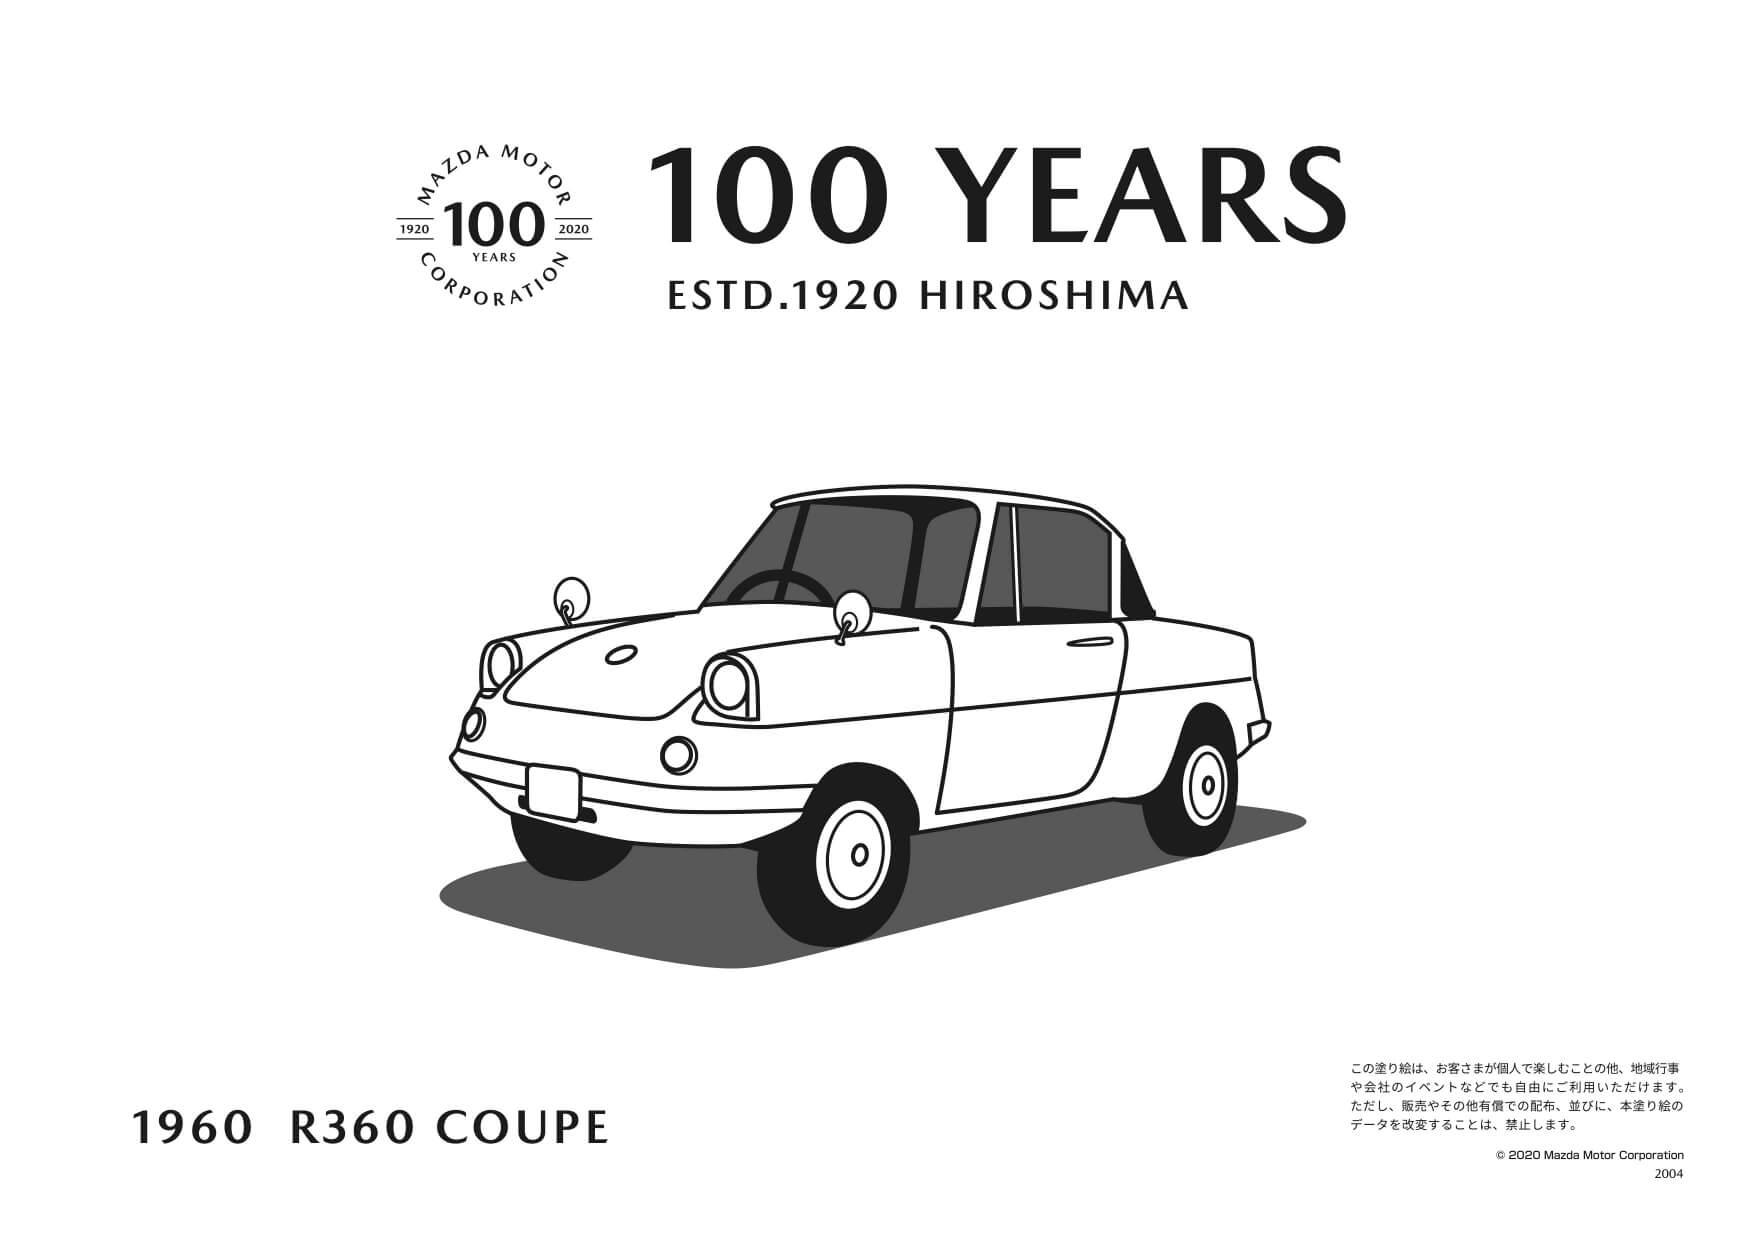 R360クーペ